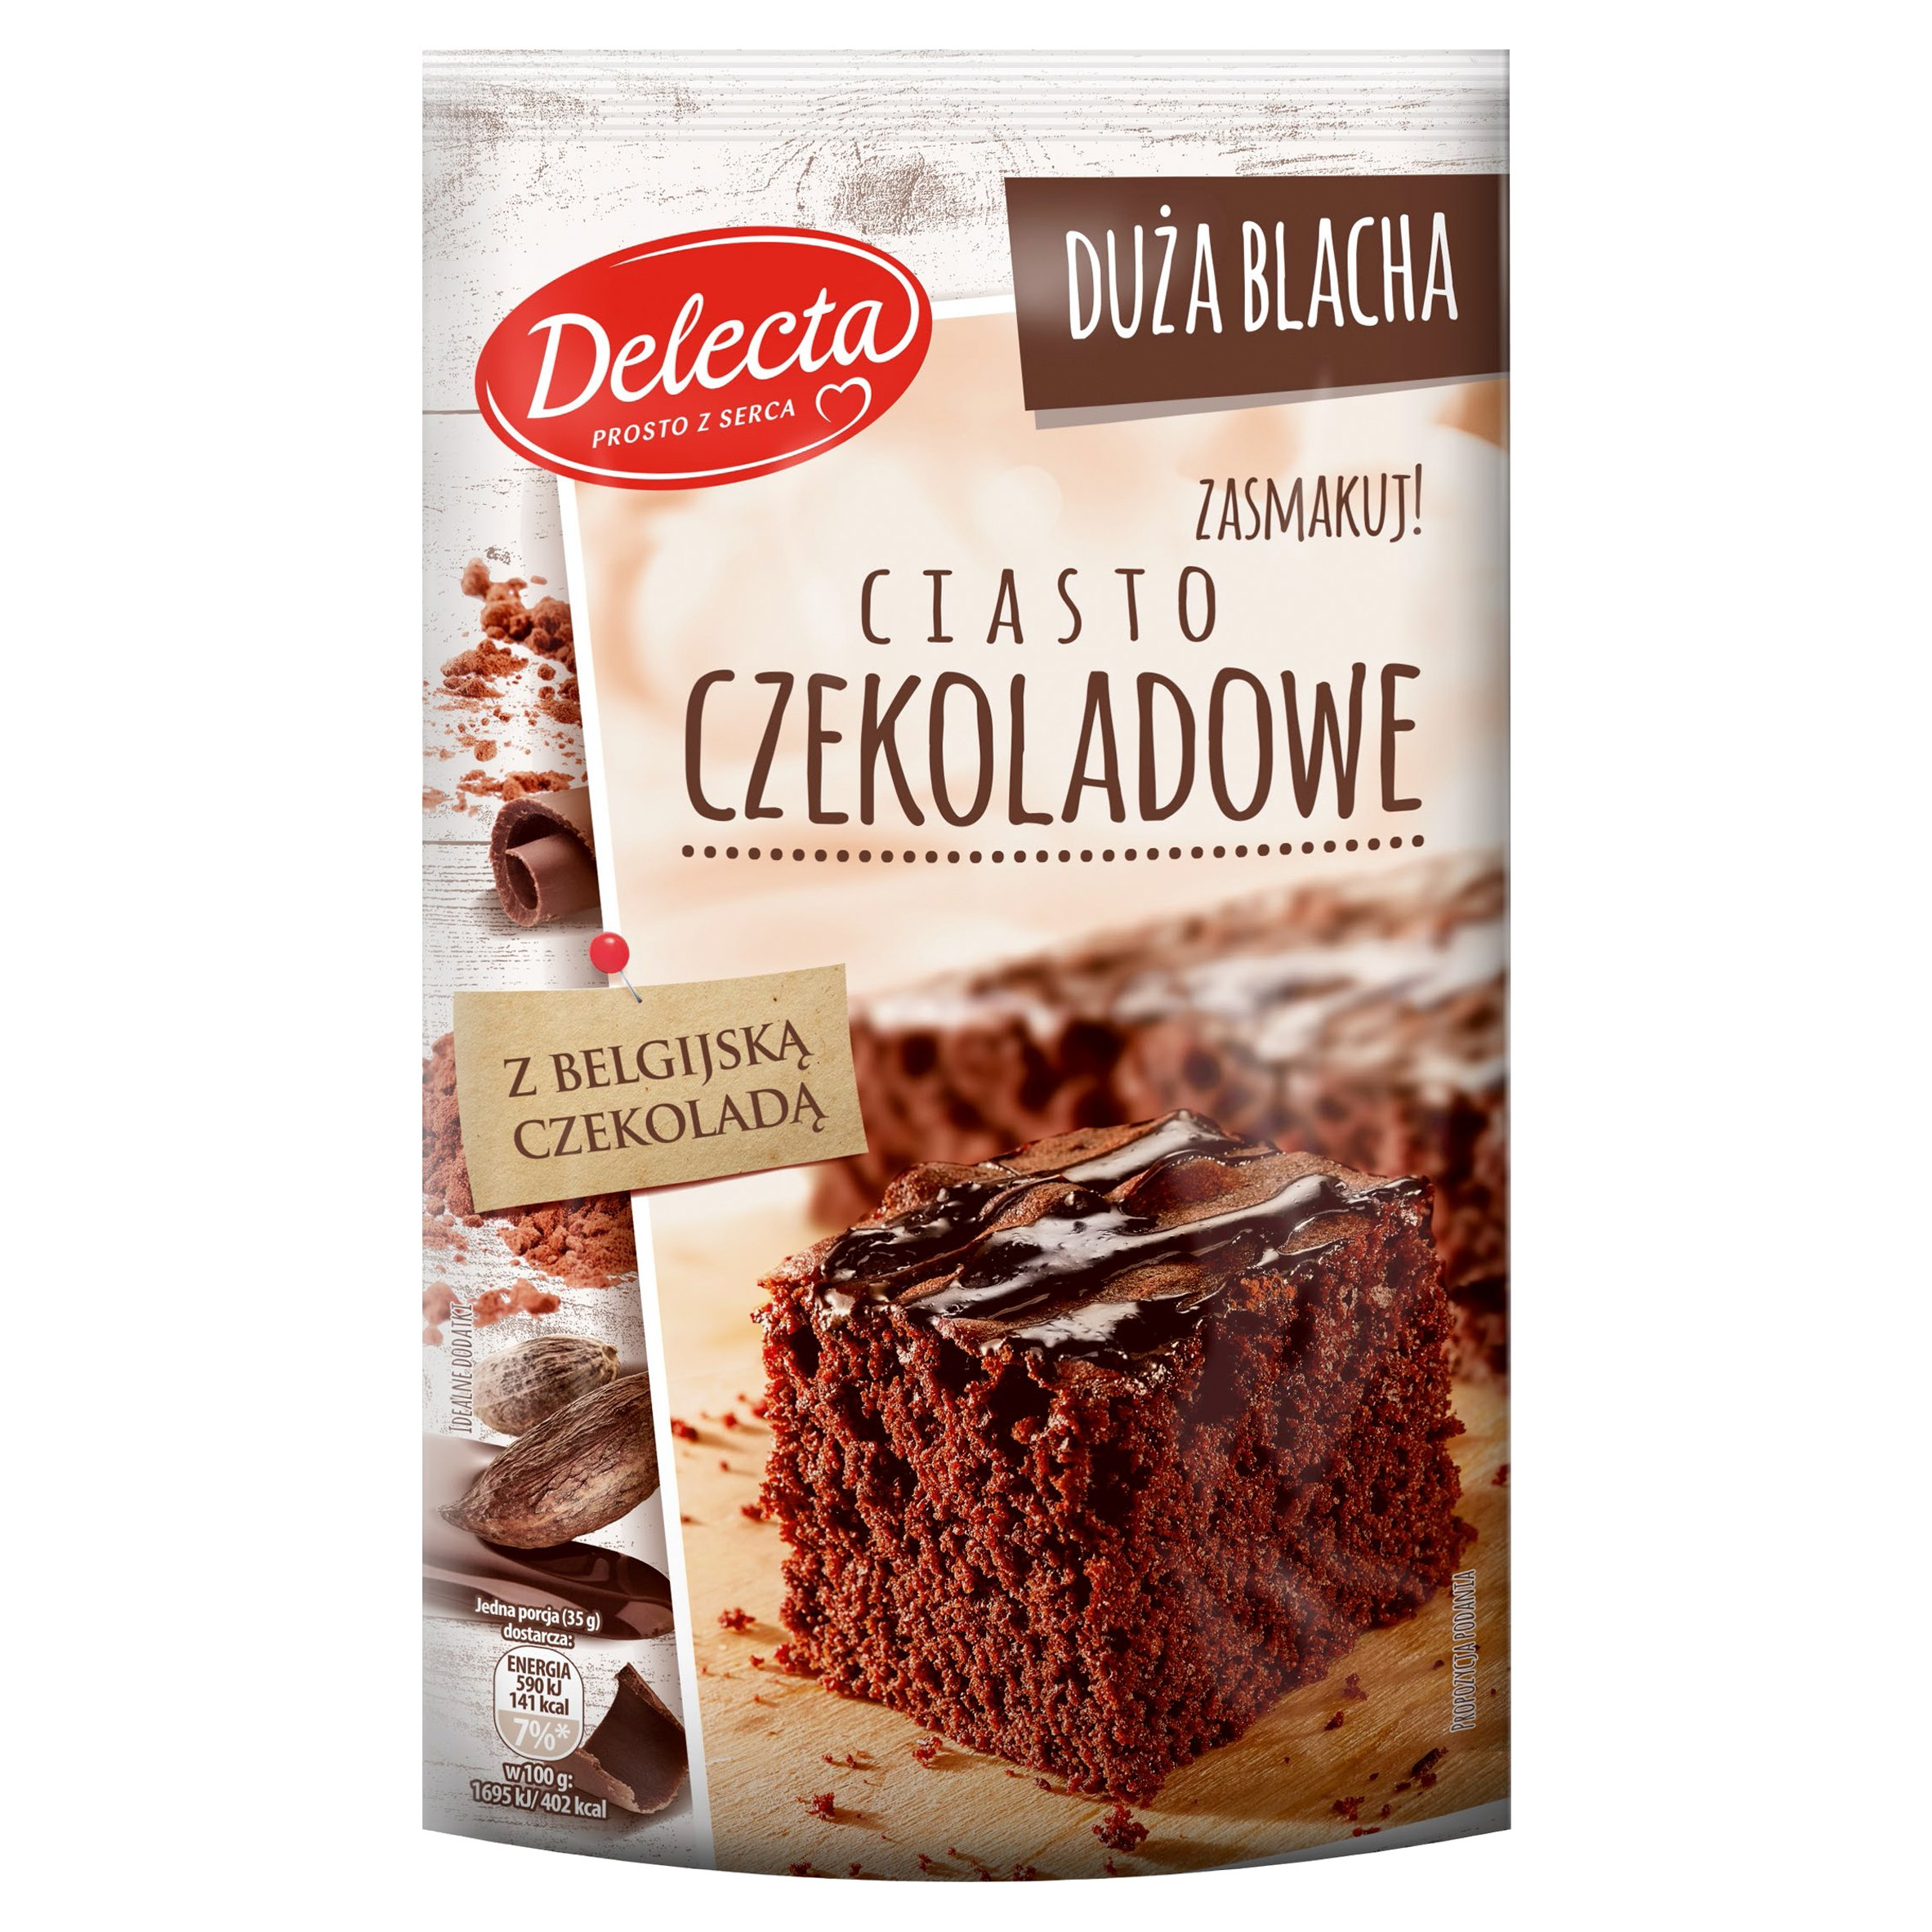 Delecta Duża Blacha Ciasto czekoladowe 670g (2)